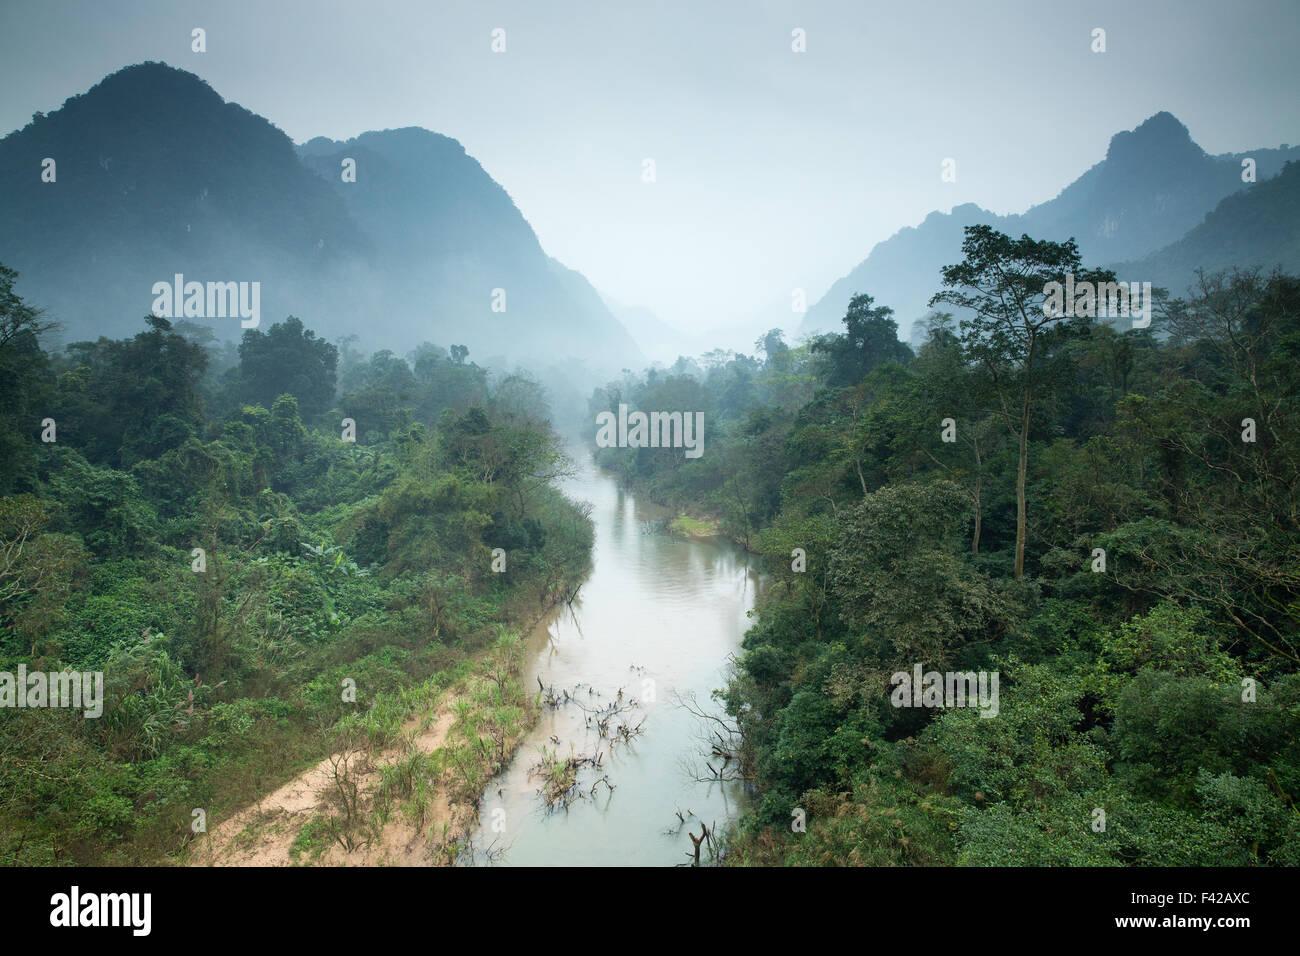 Phong Nha-K? Bàng ist ein Nationalpark und UNESCO-Weltkulturerbe, Provinz Qu?ng Bình, Vietnam Stockbild